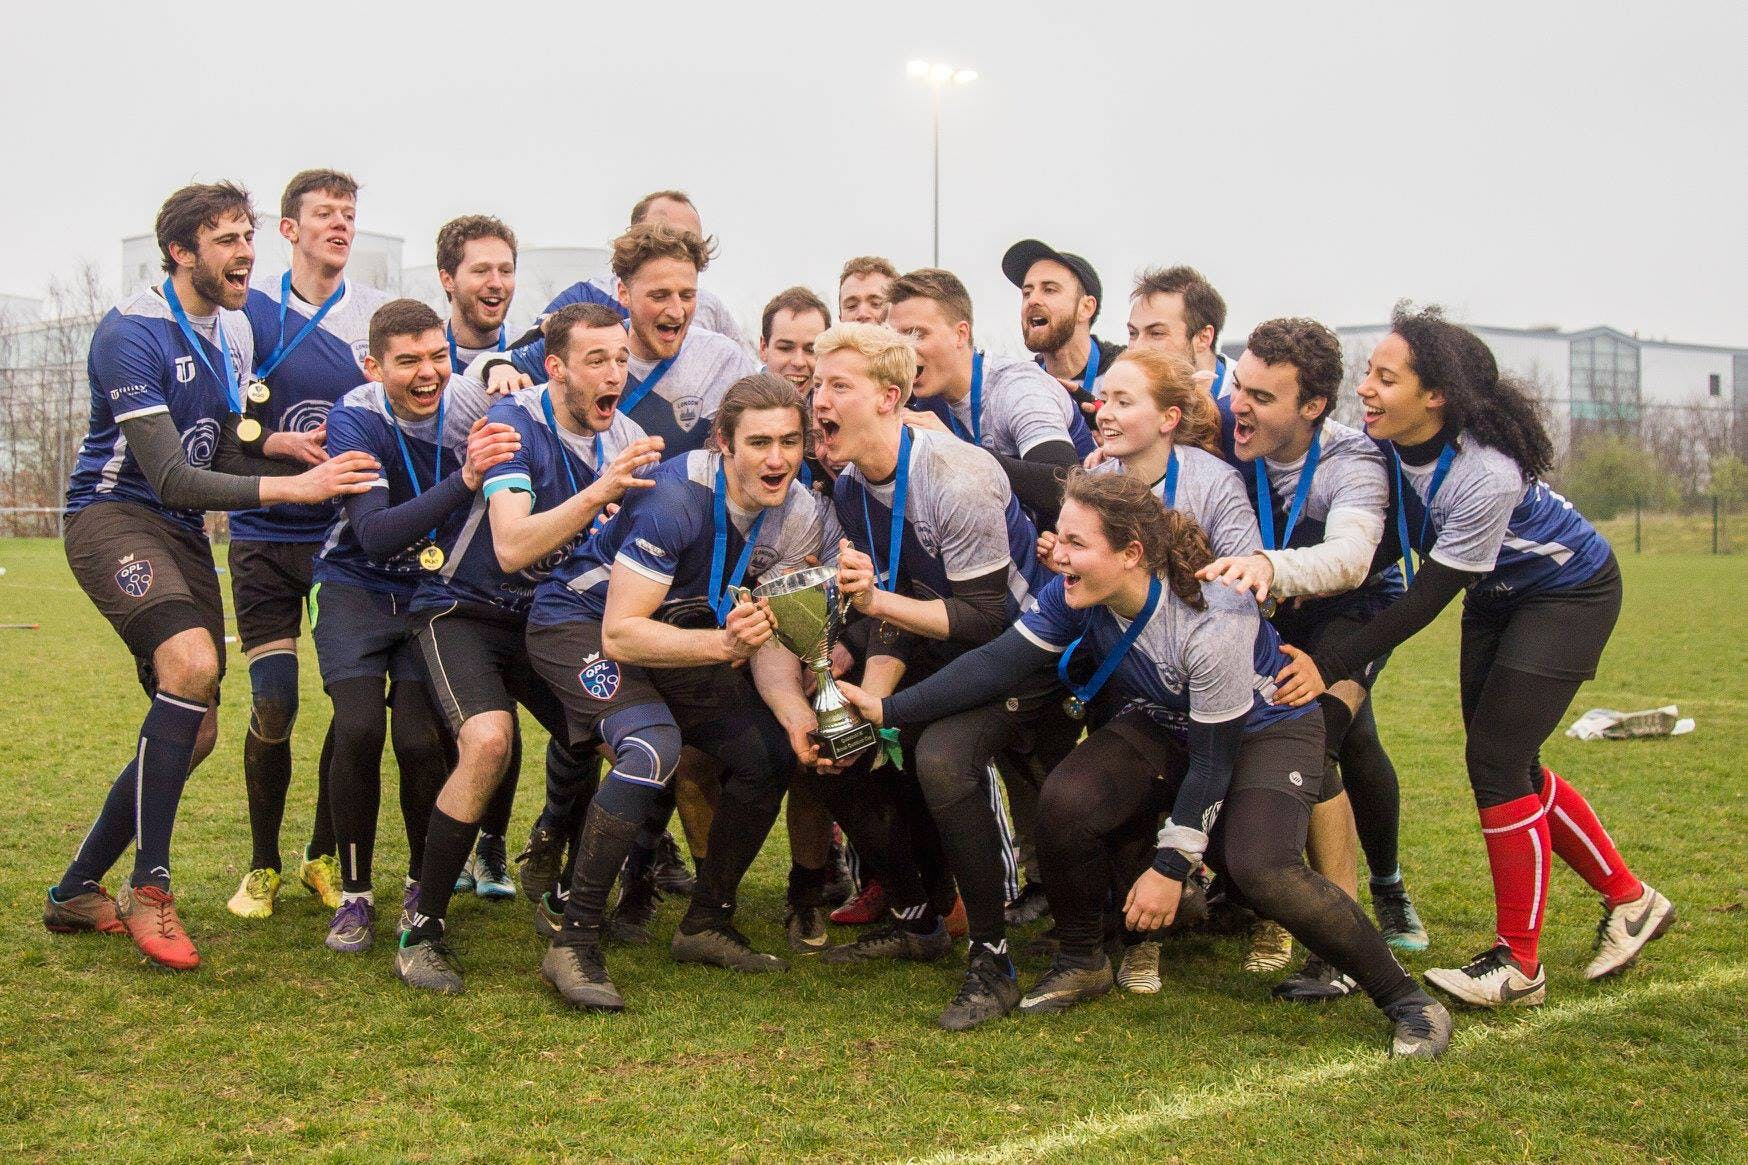 London Quidditch Club lift the BQC Trophy